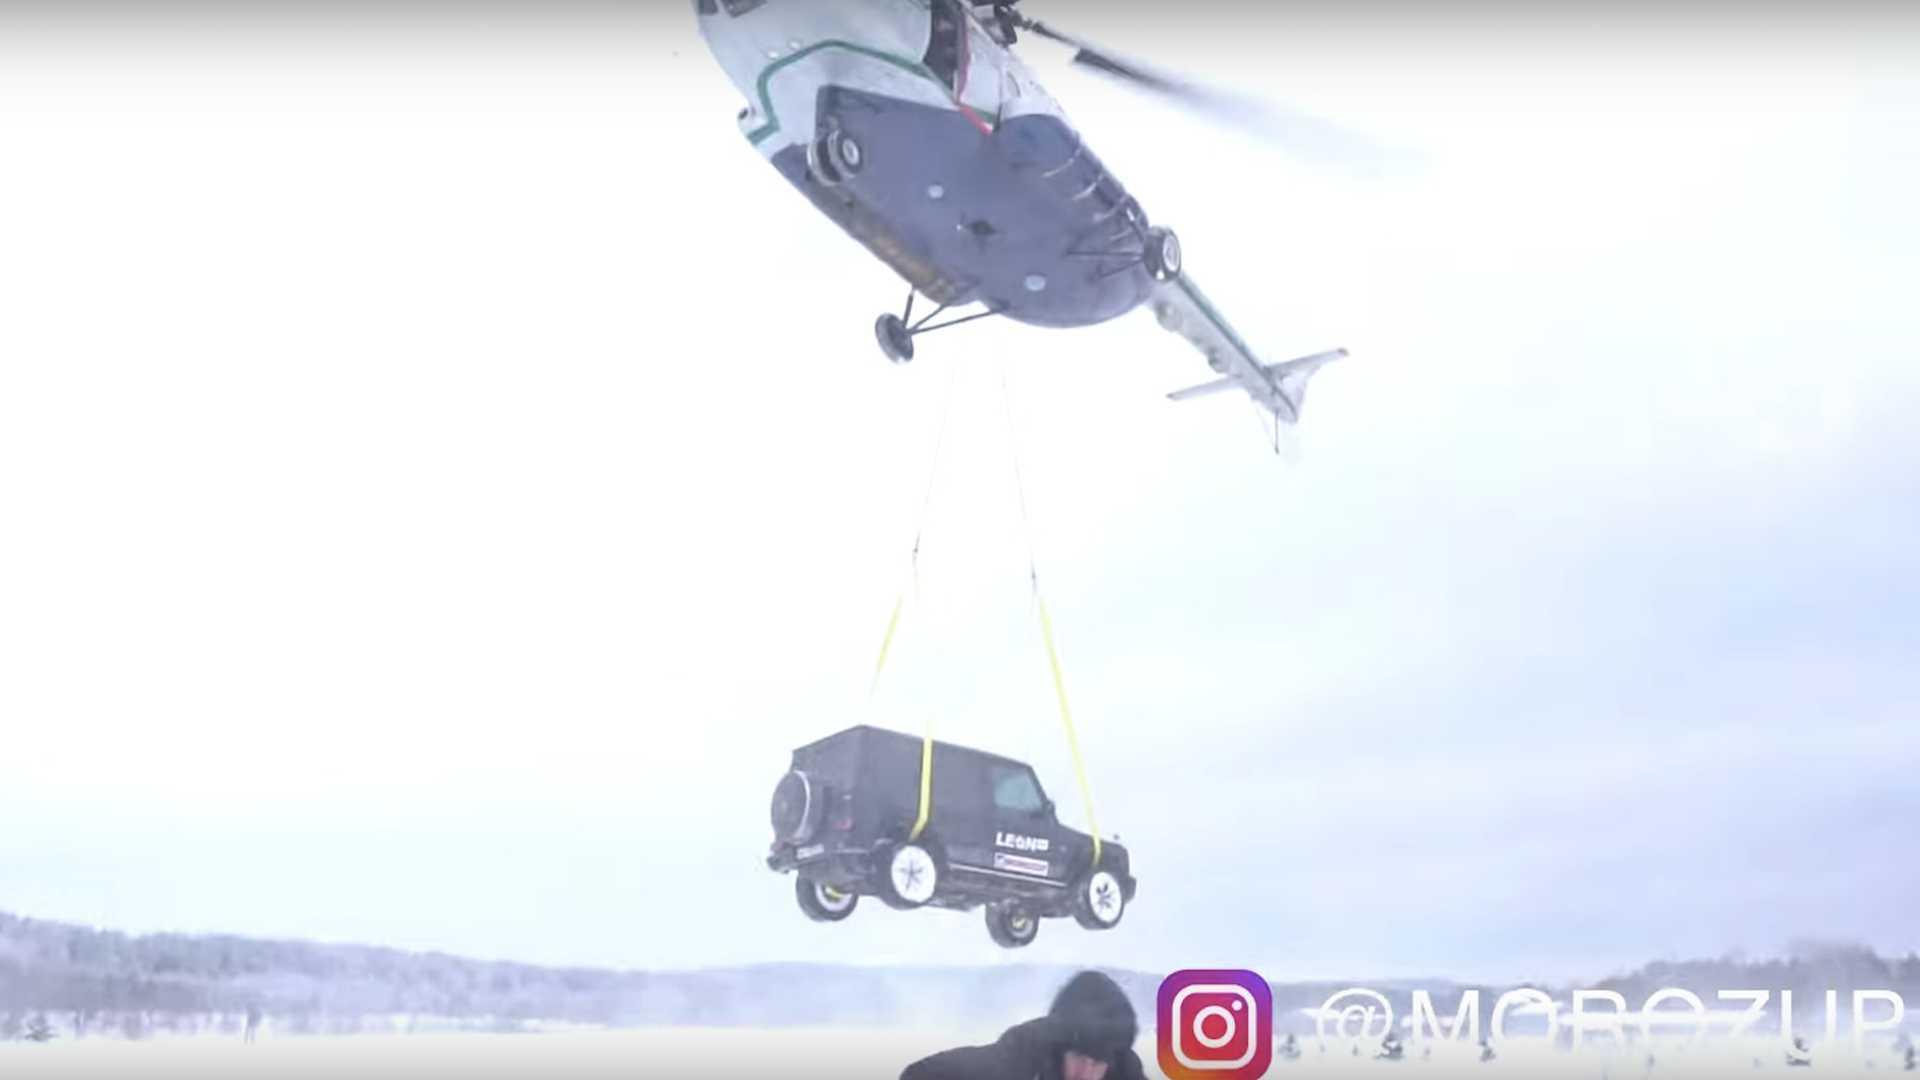 Nezadovoljan vlasnik Mercedes-AMG-a G63 bacio vozio na tlo s 300 metara visine (VIDEO)